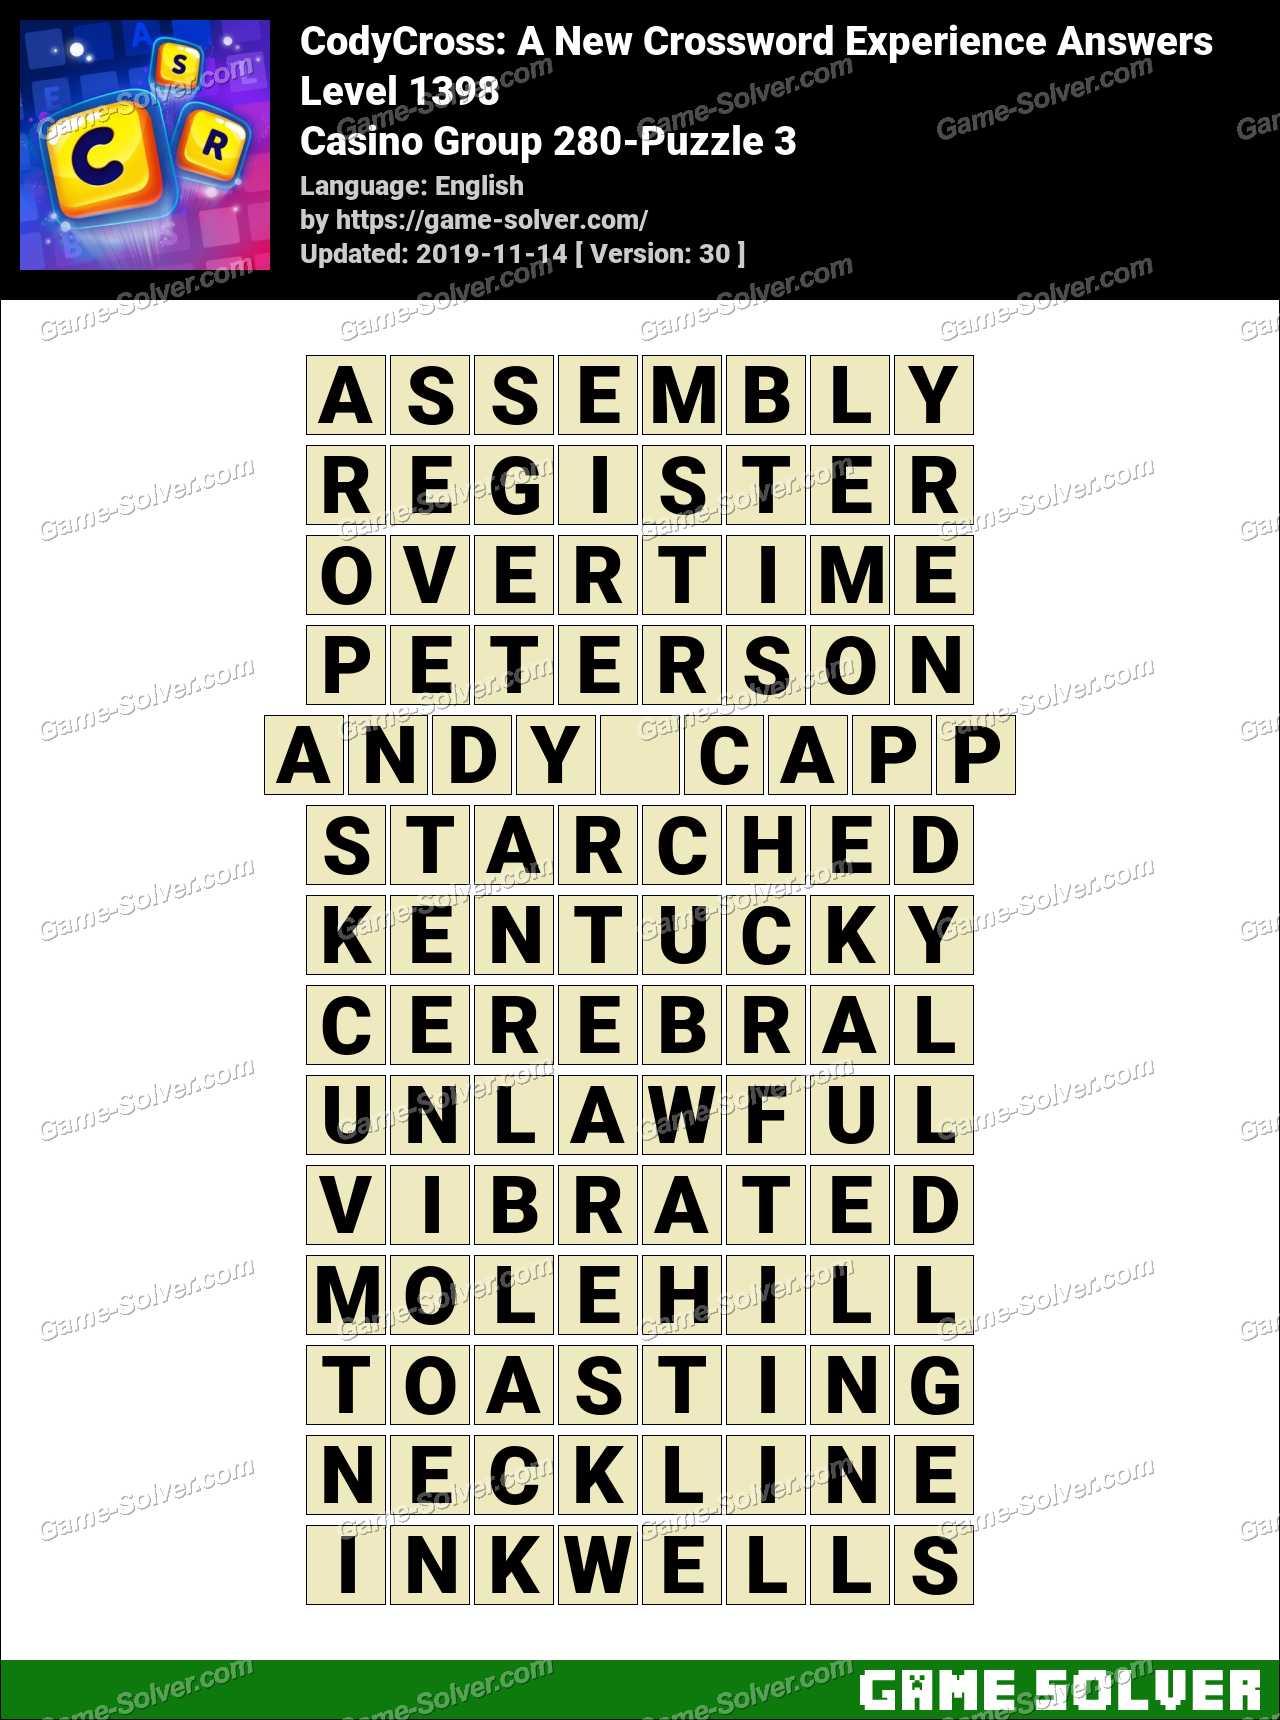 CodyCross Casino Group 280-Puzzle 3 Answers